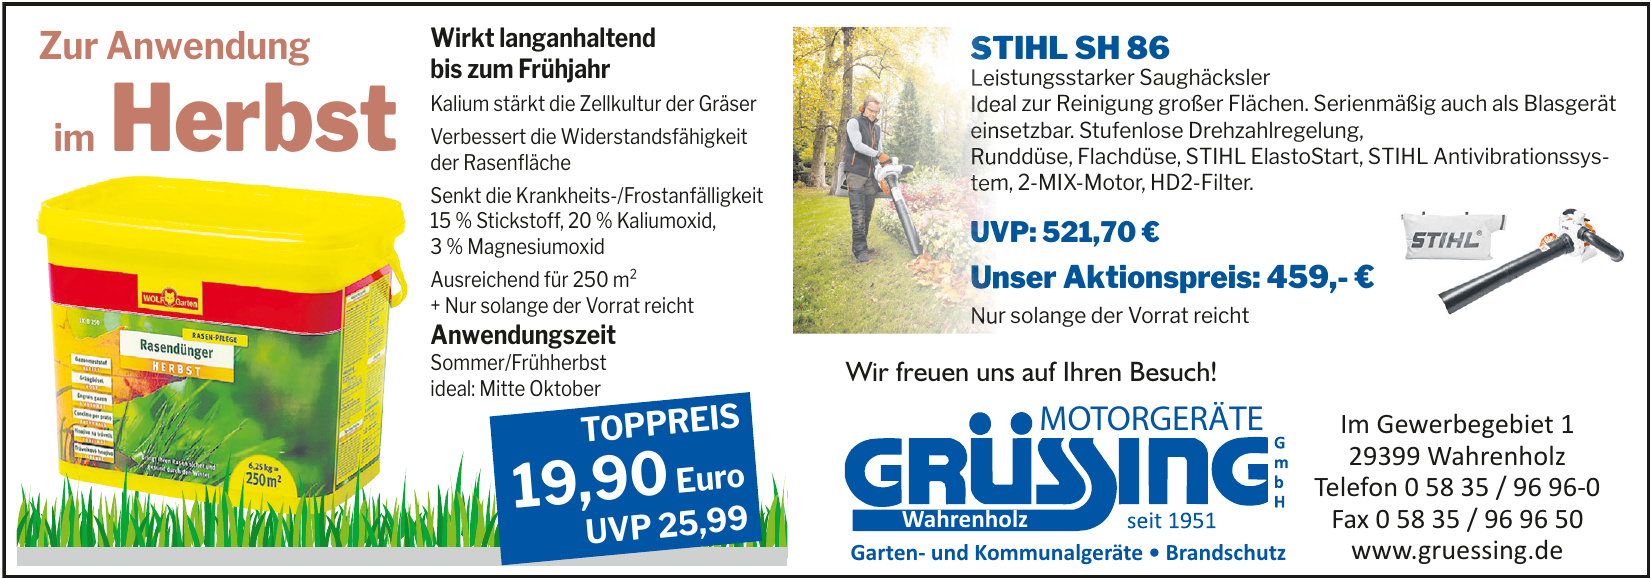 Grüssing GmbH